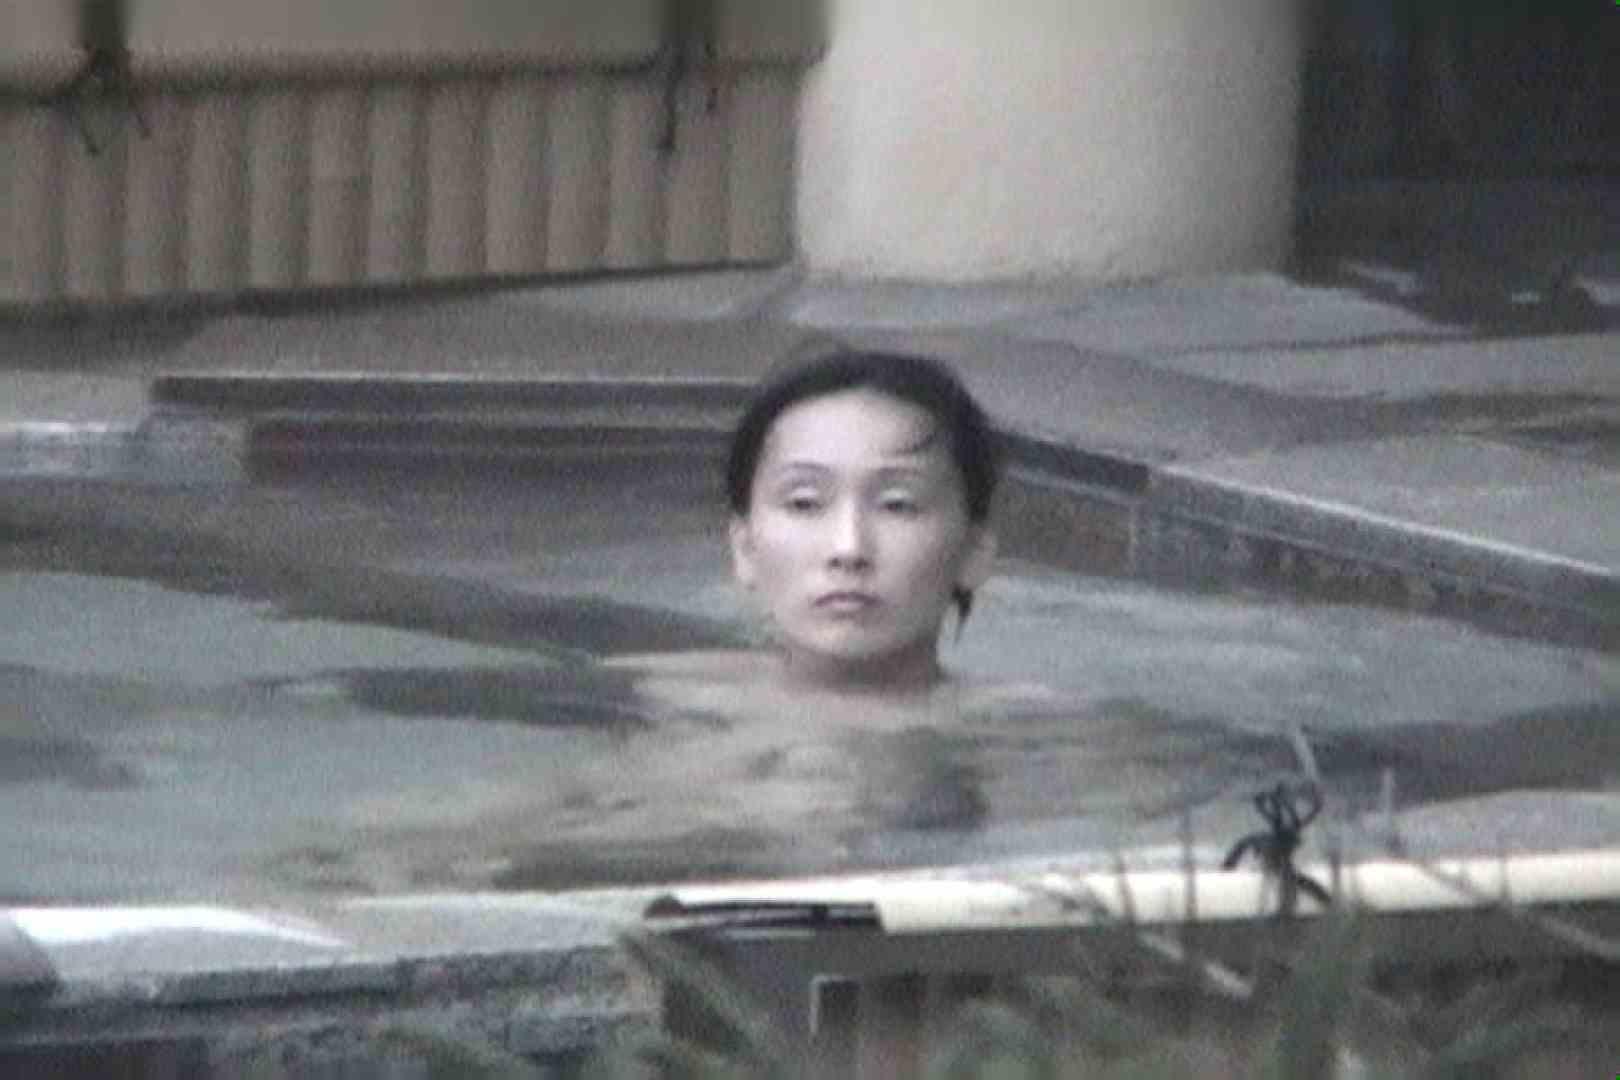 Aquaな露天風呂Vol.557 露天風呂編 | 盗撮シリーズ  100PIX 1